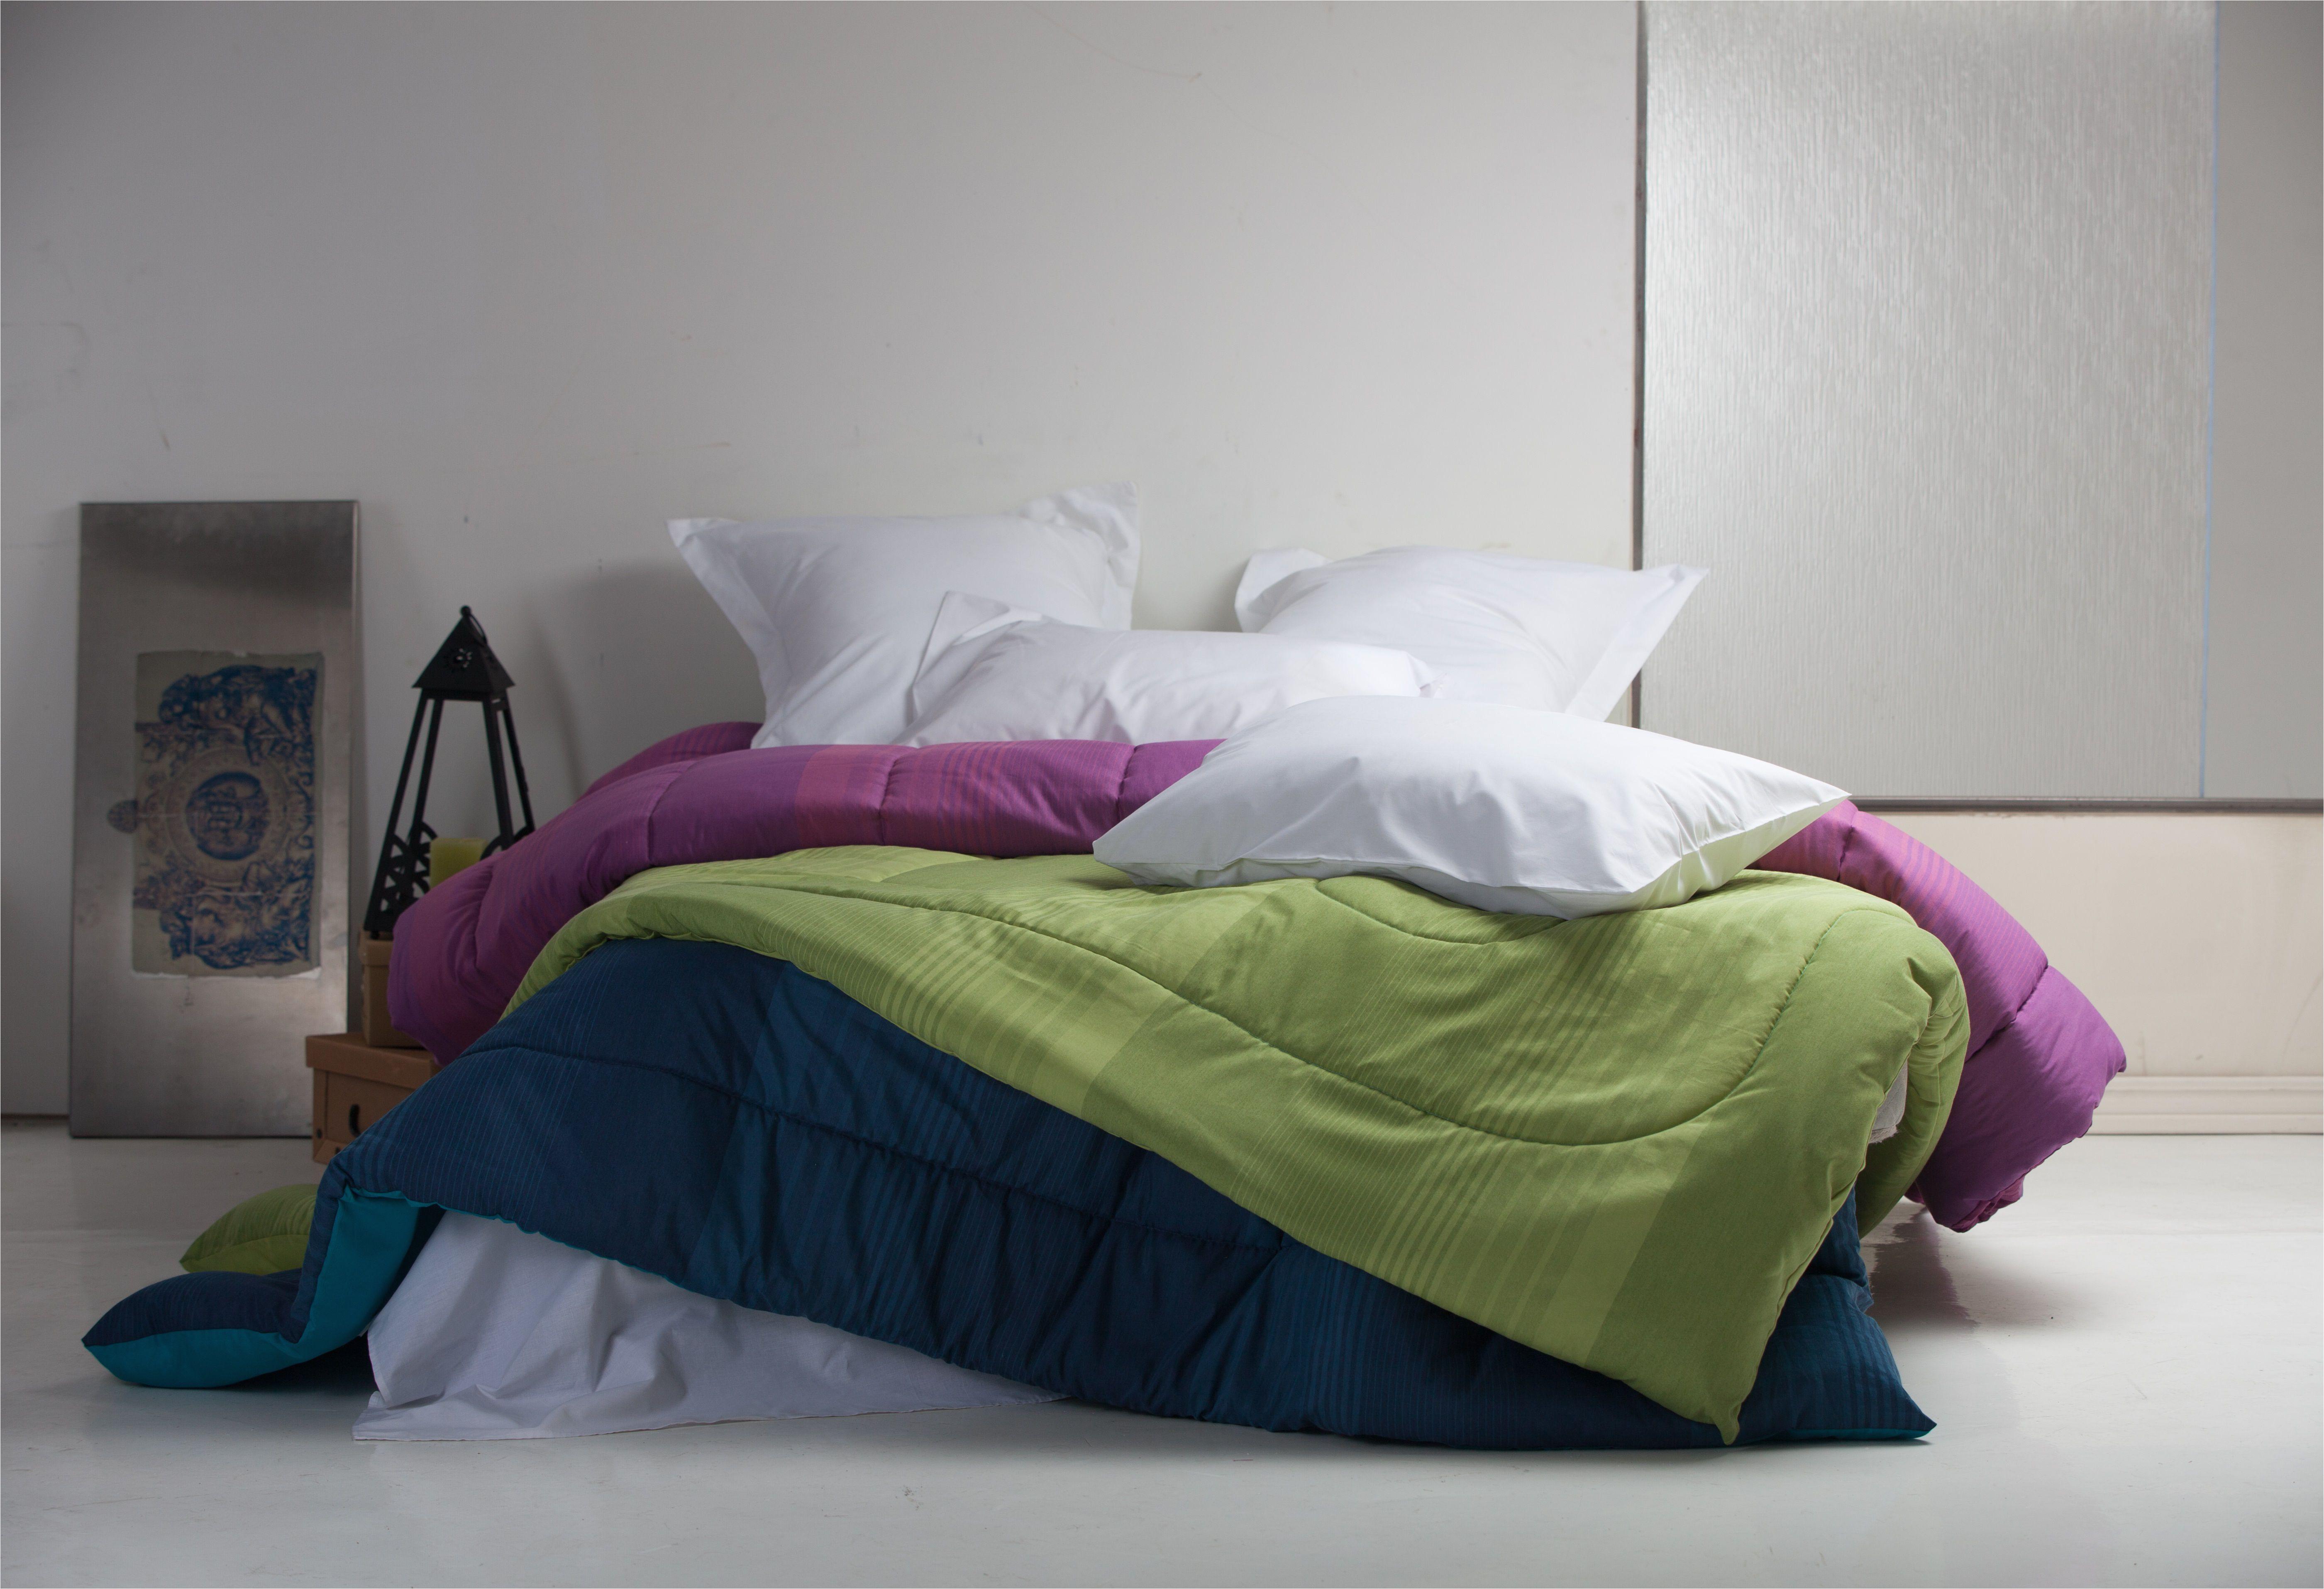 bedwithcomforter 593741623df78c537ba24584 jpg